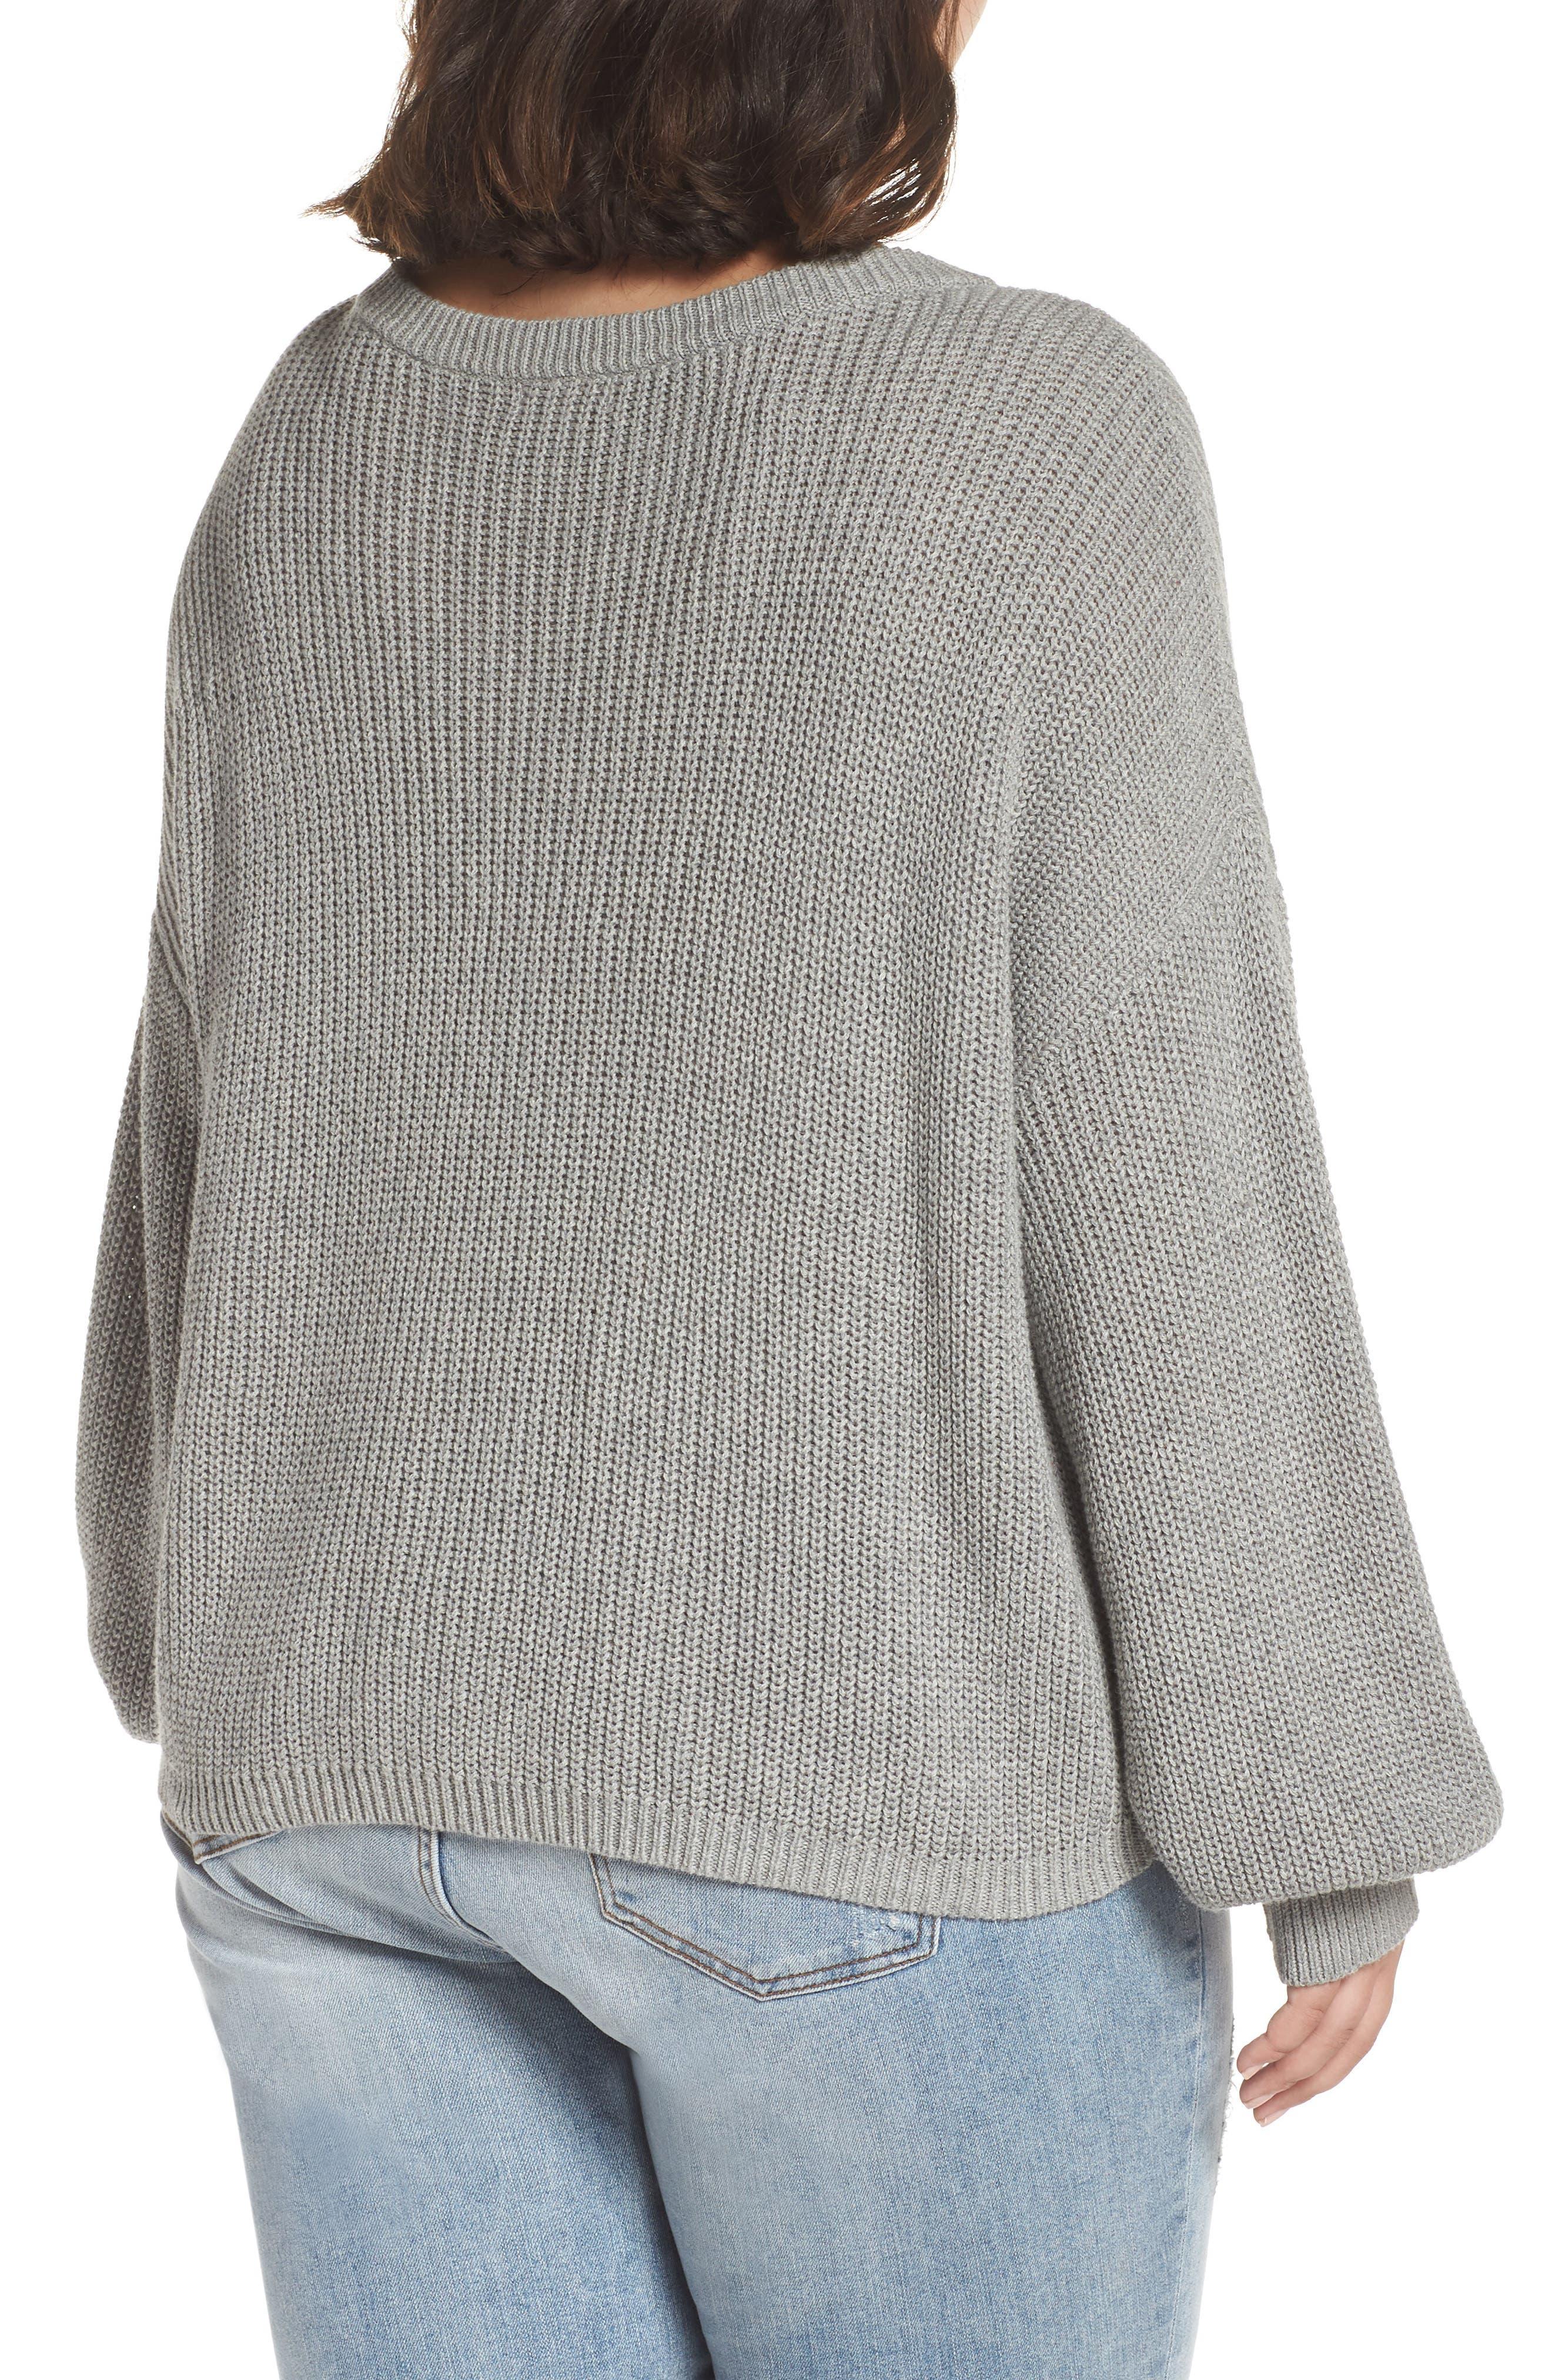 V Neck Cotton Sweater,                             Alternate thumbnail 8, color,                             030